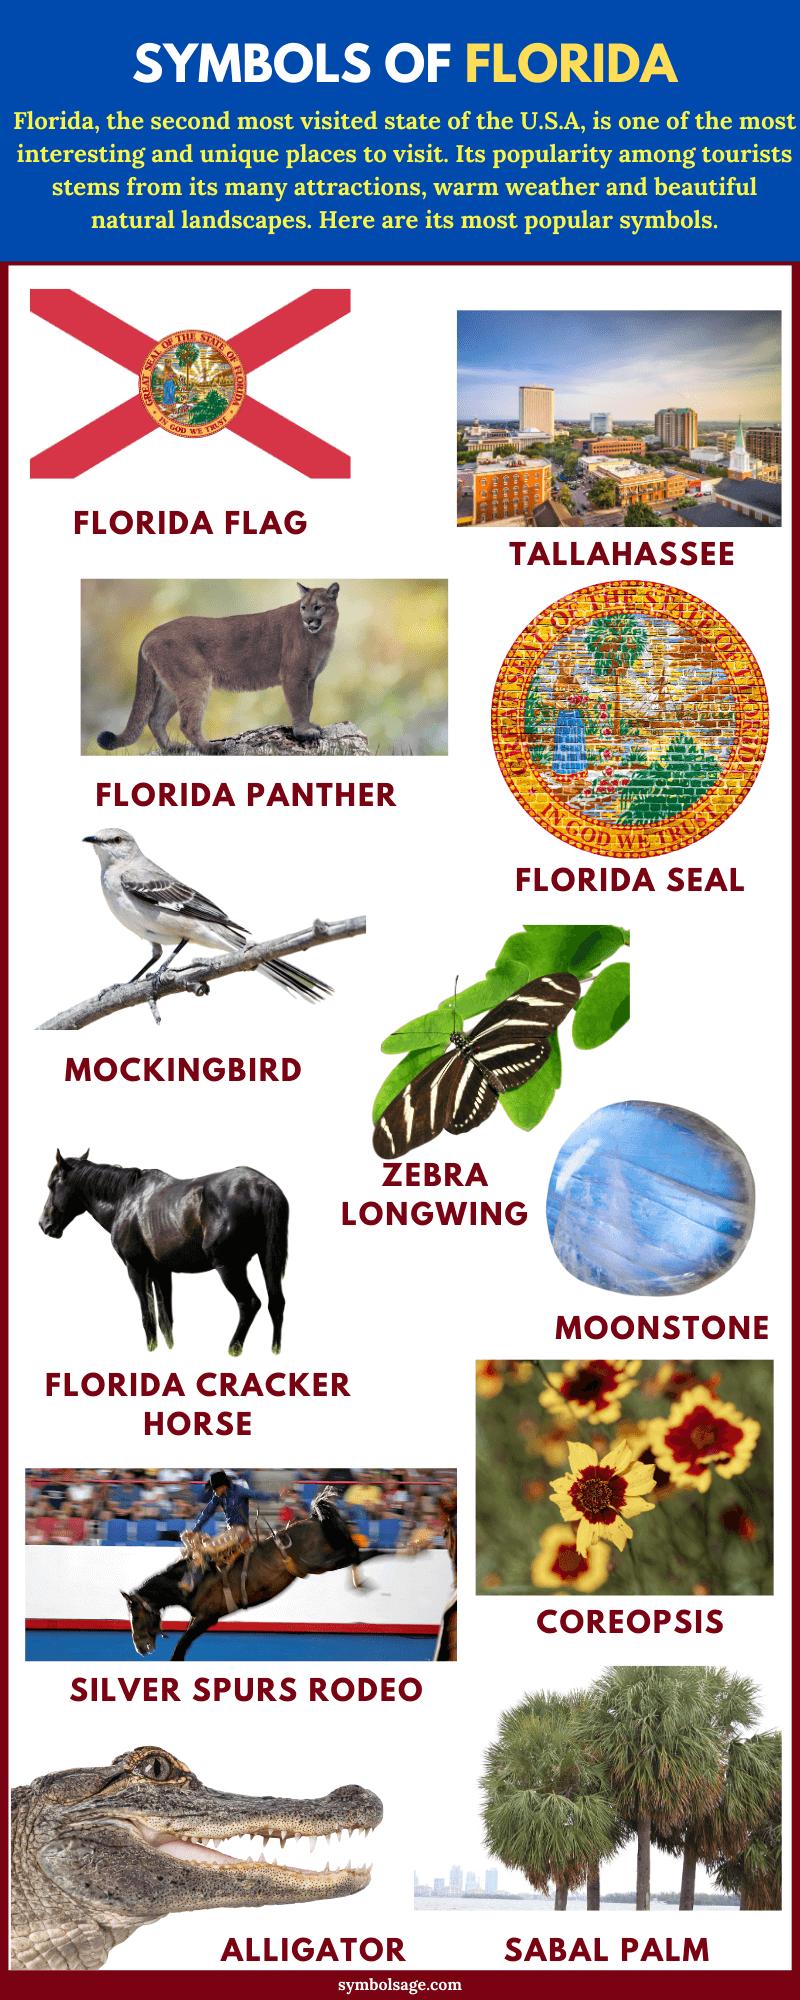 List of Florida symbols